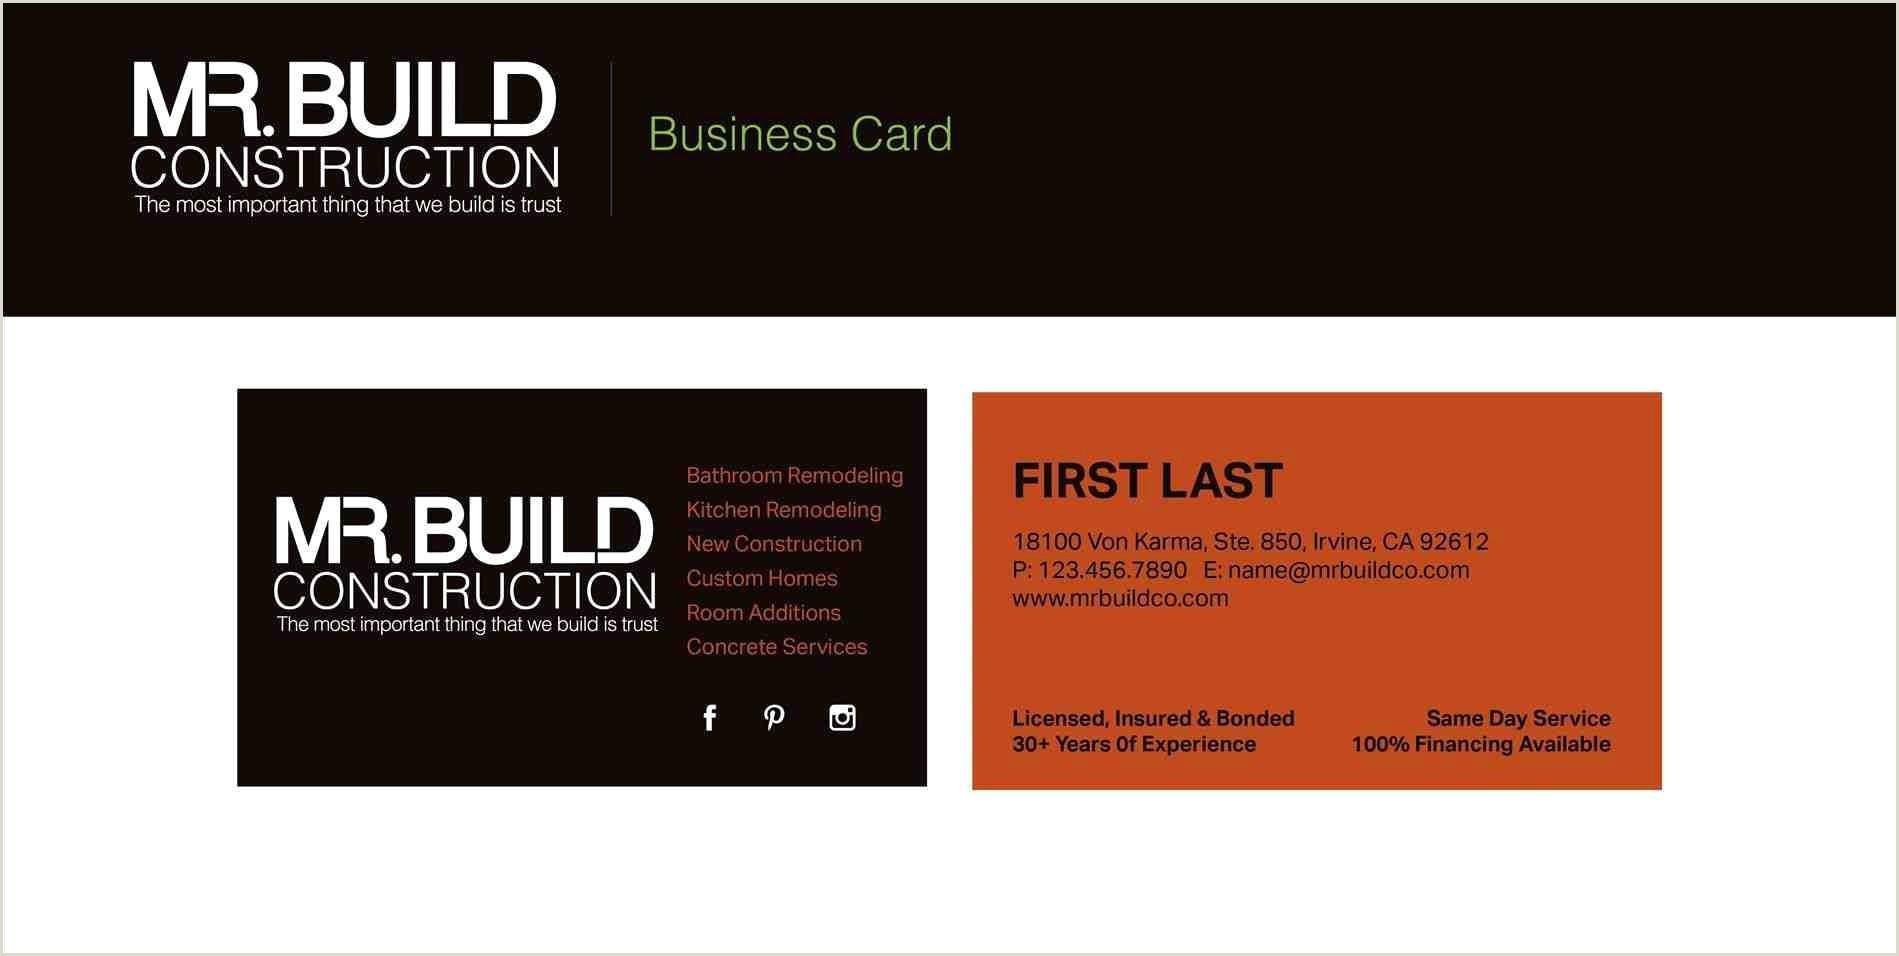 Business Card Layout Ideas 14 Popular Hardwood Flooring Business Card Template